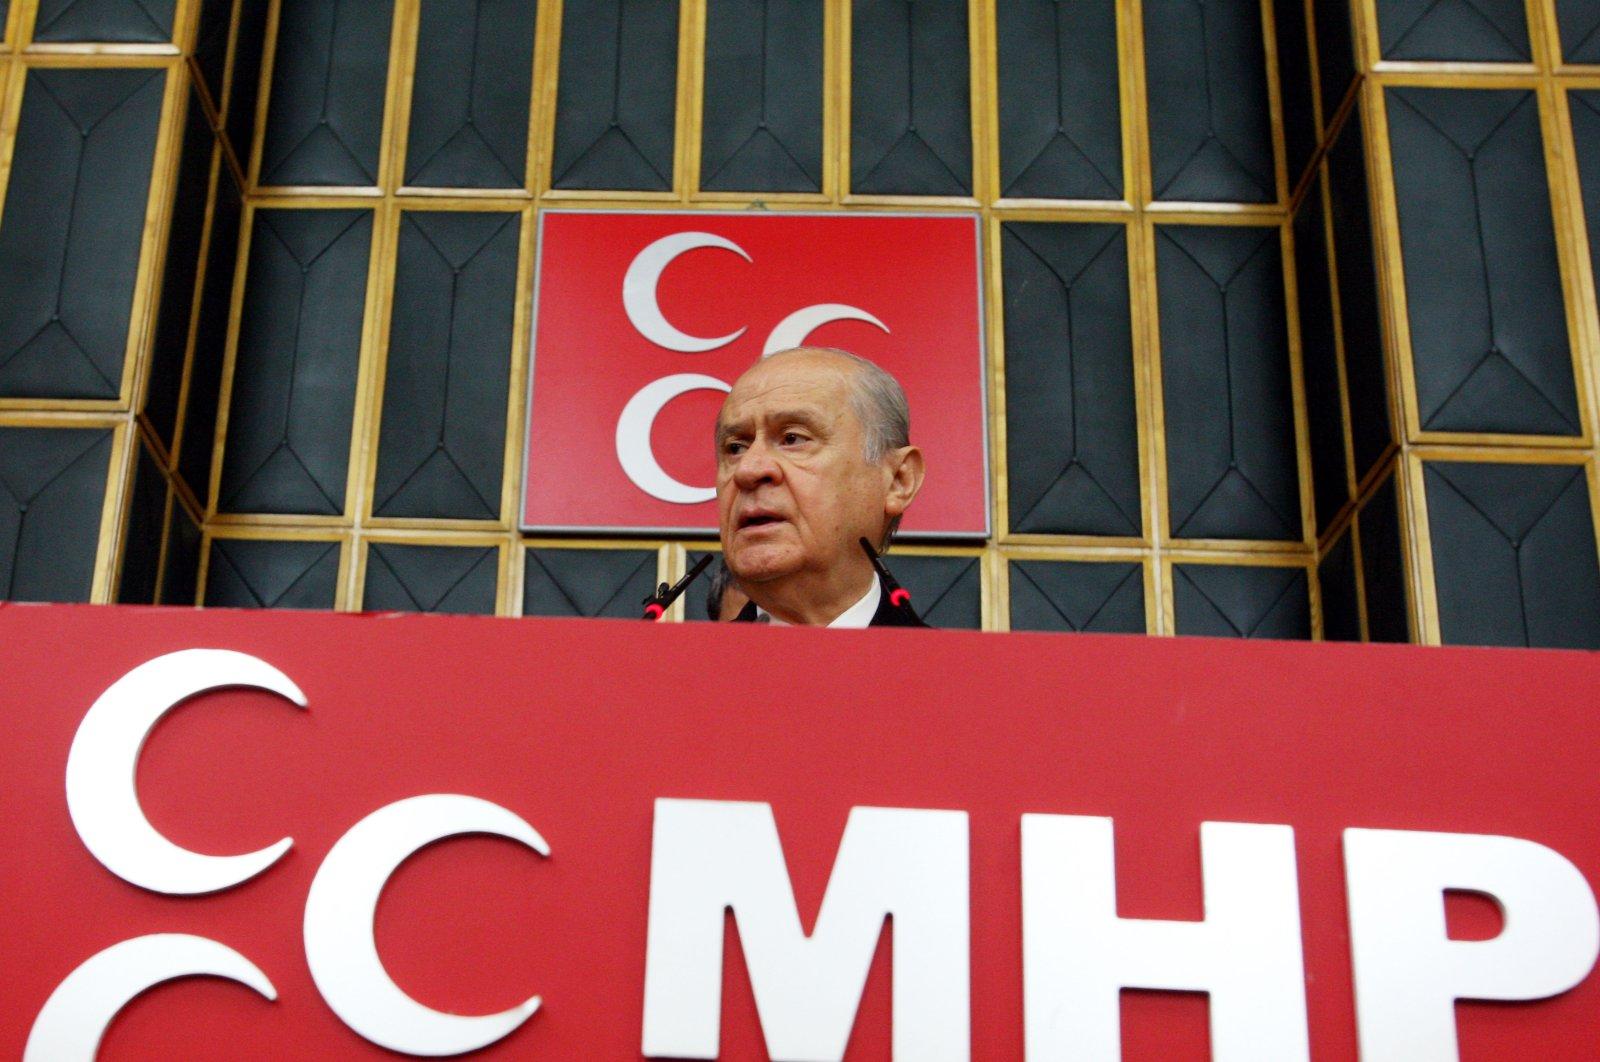 MHP Chairperson Devlet Bahçeli speaks at his party's parliamentary group meeting in Ankara, Turkey, June 15, 2021. (Sabah Photo)